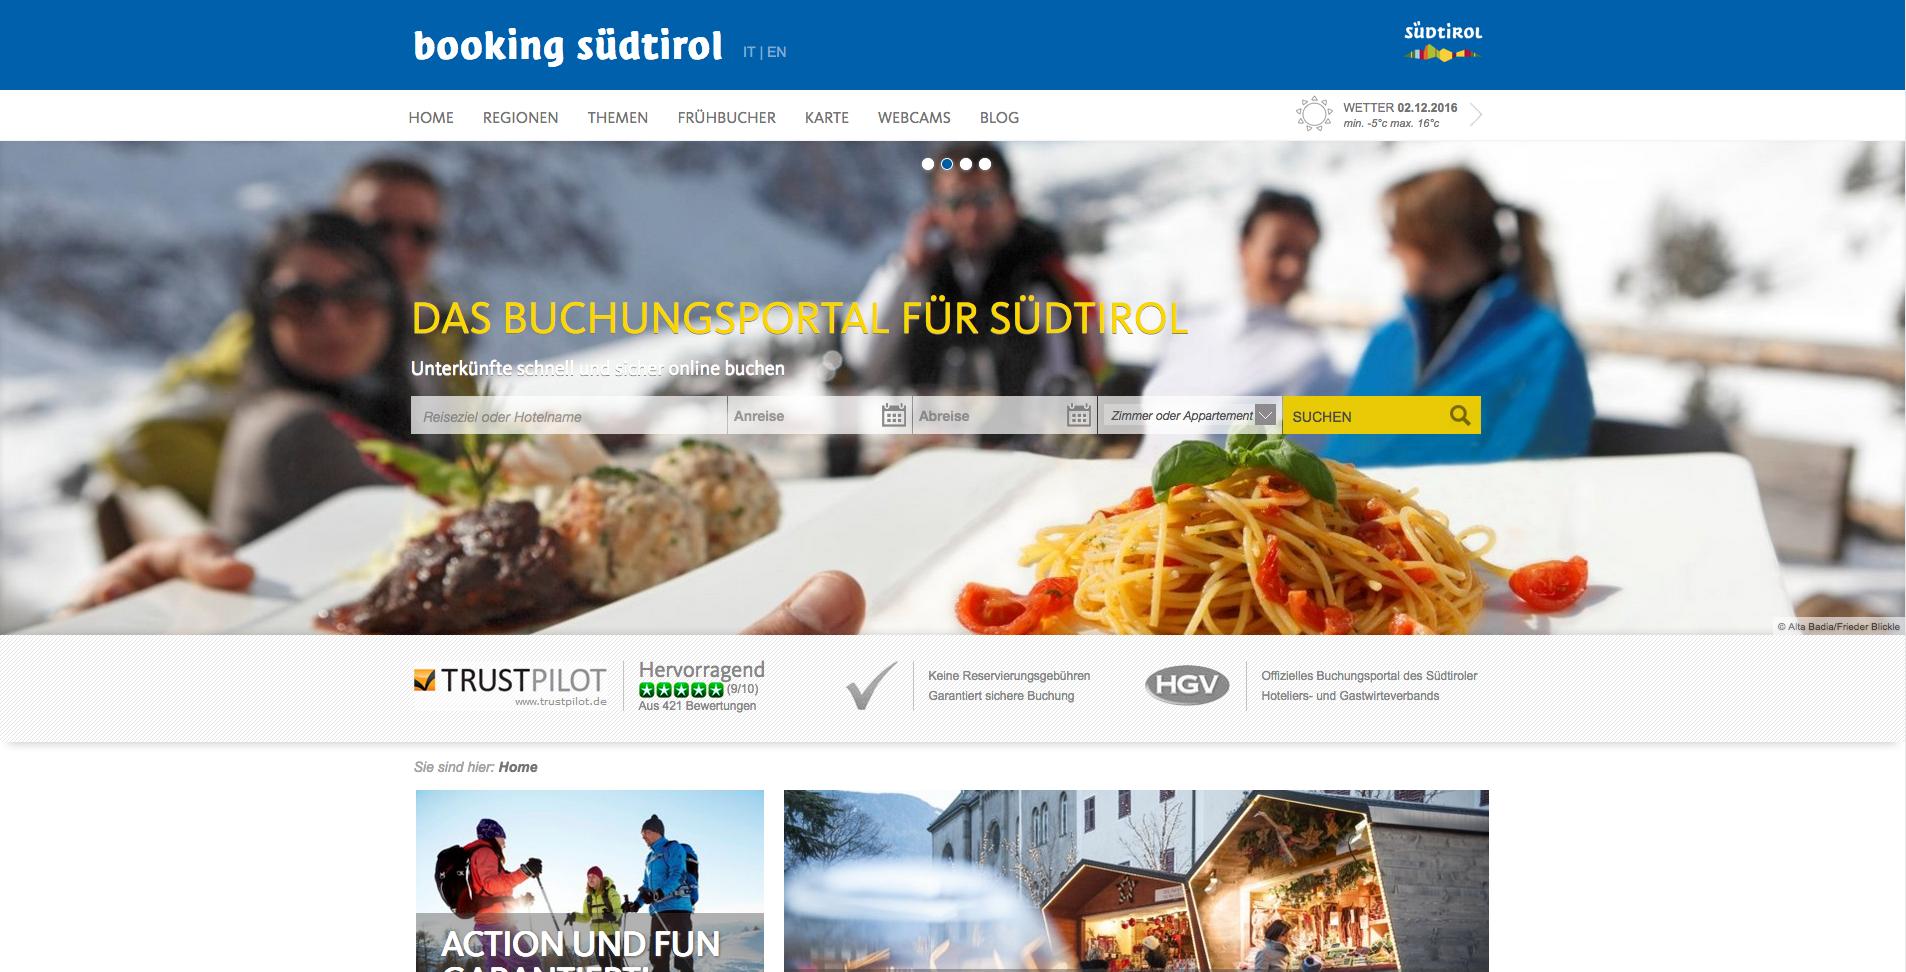 booking-sued-tirol-de